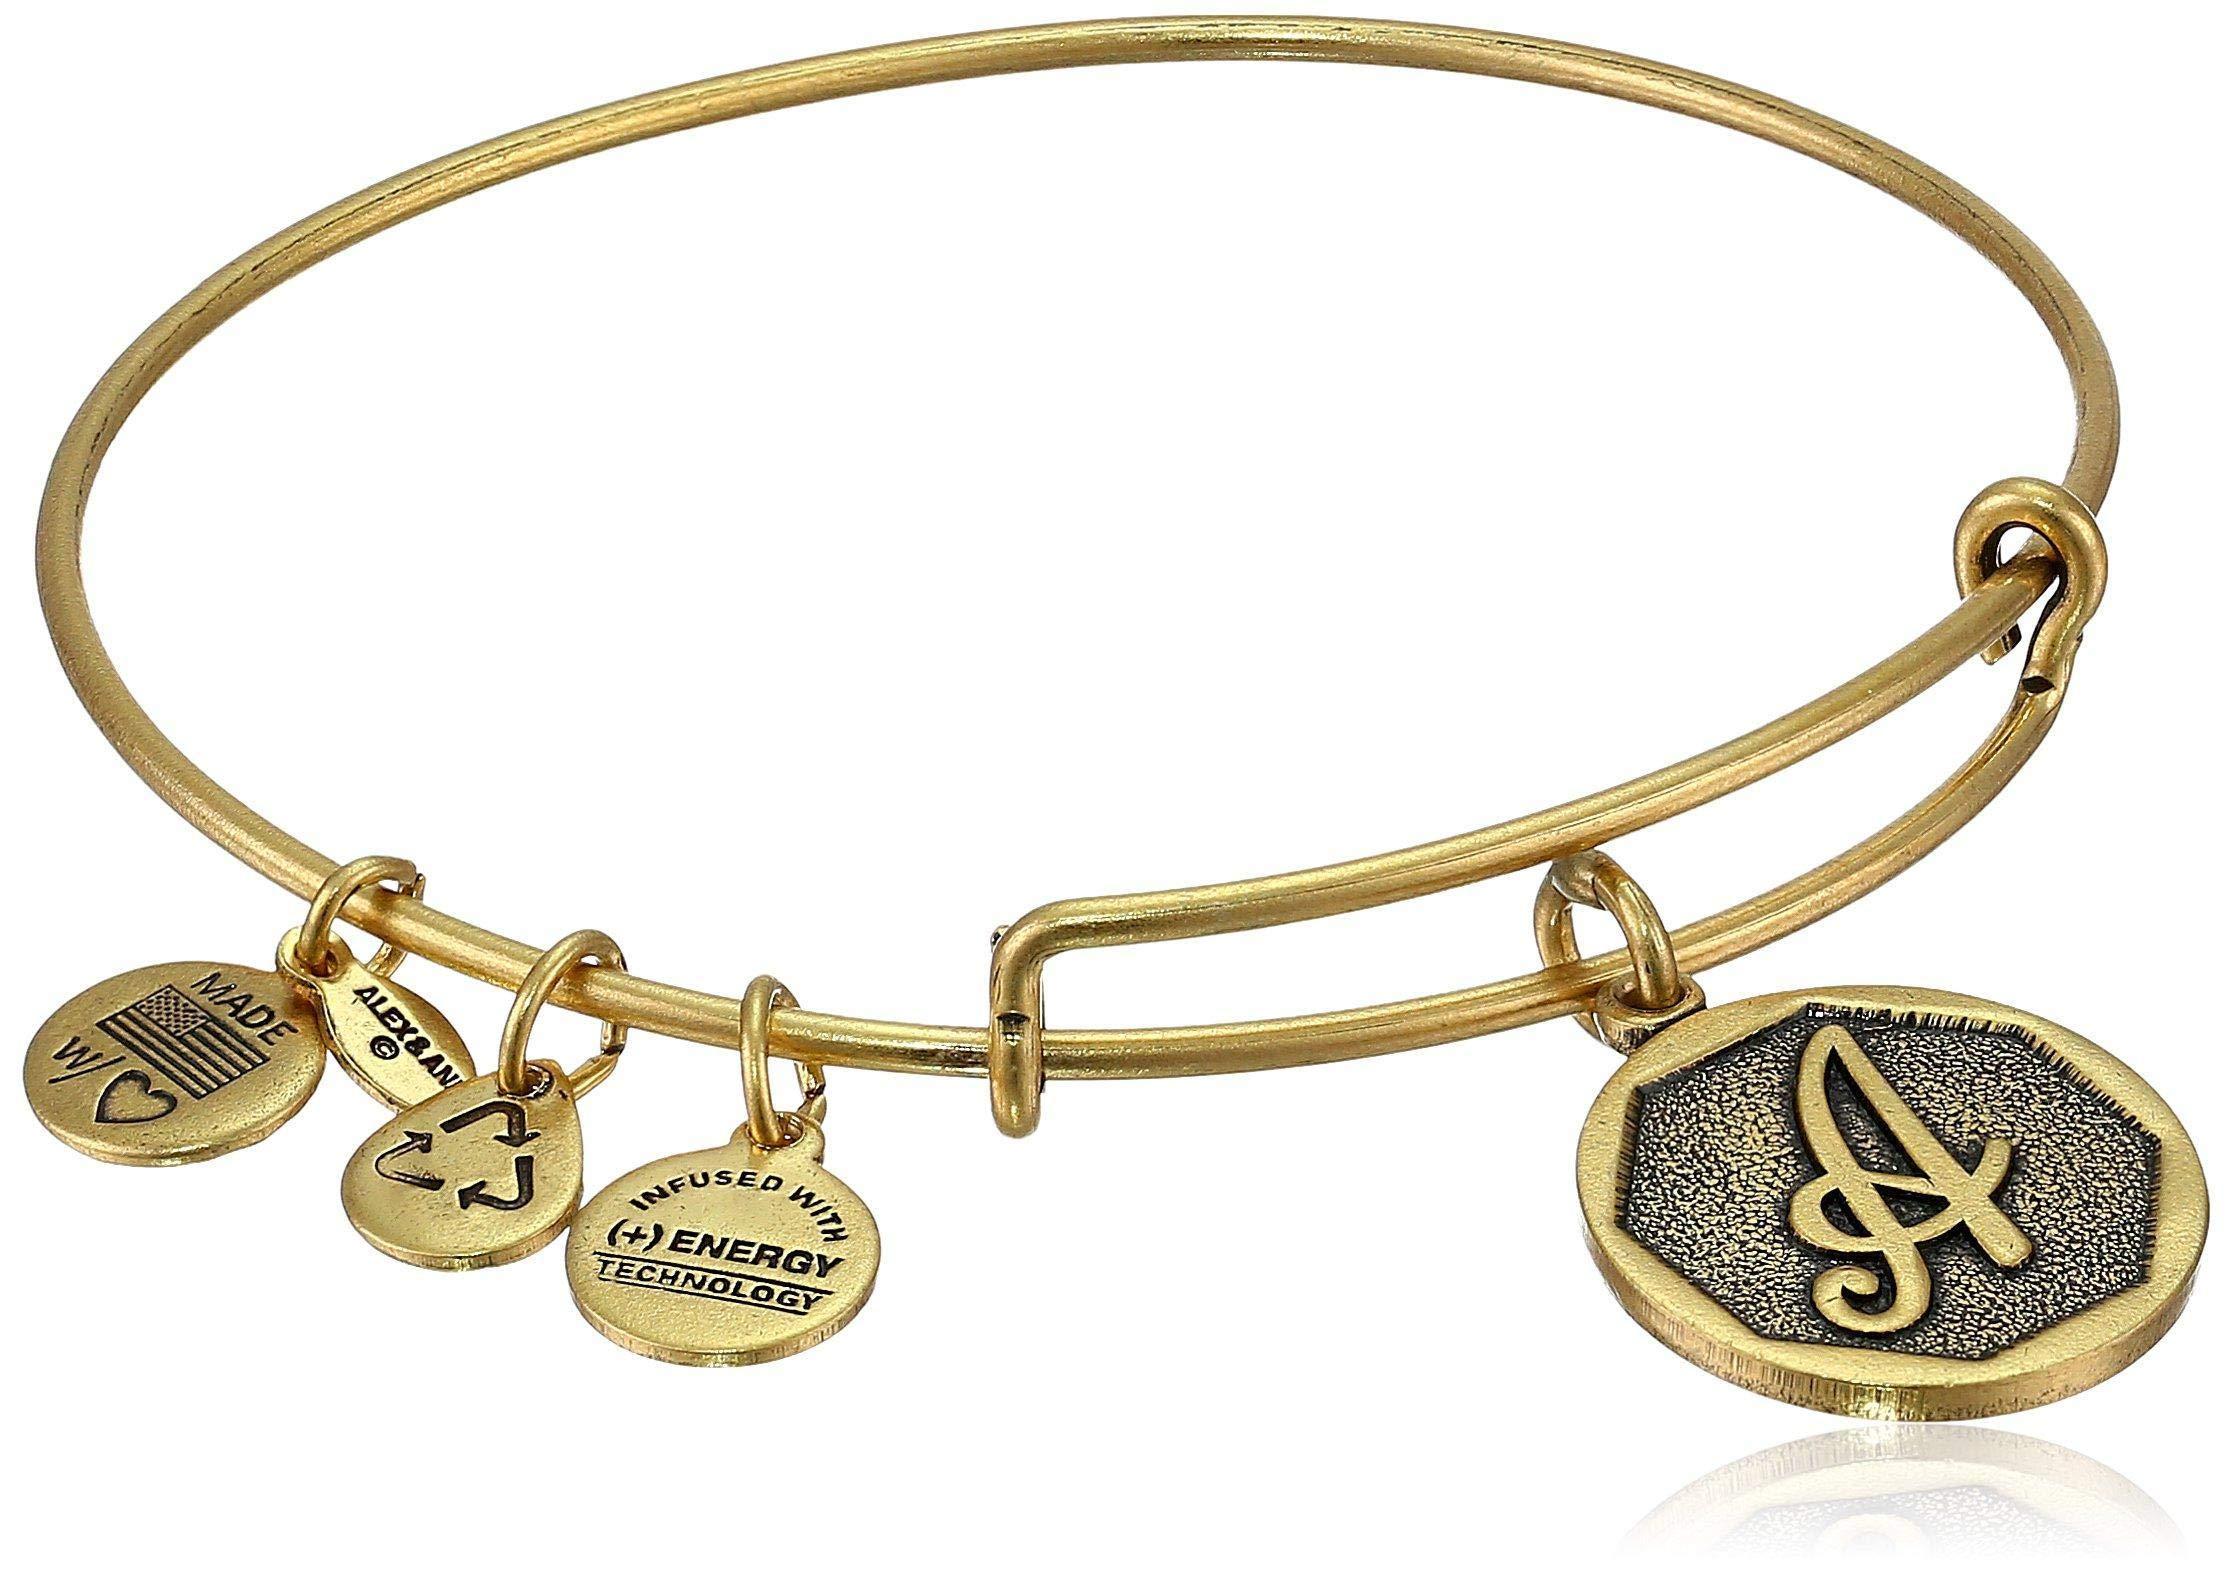 Oldlila 1pcs Initial Expandable Wire Bangle Bracelet for Women (size:2.5 inch)